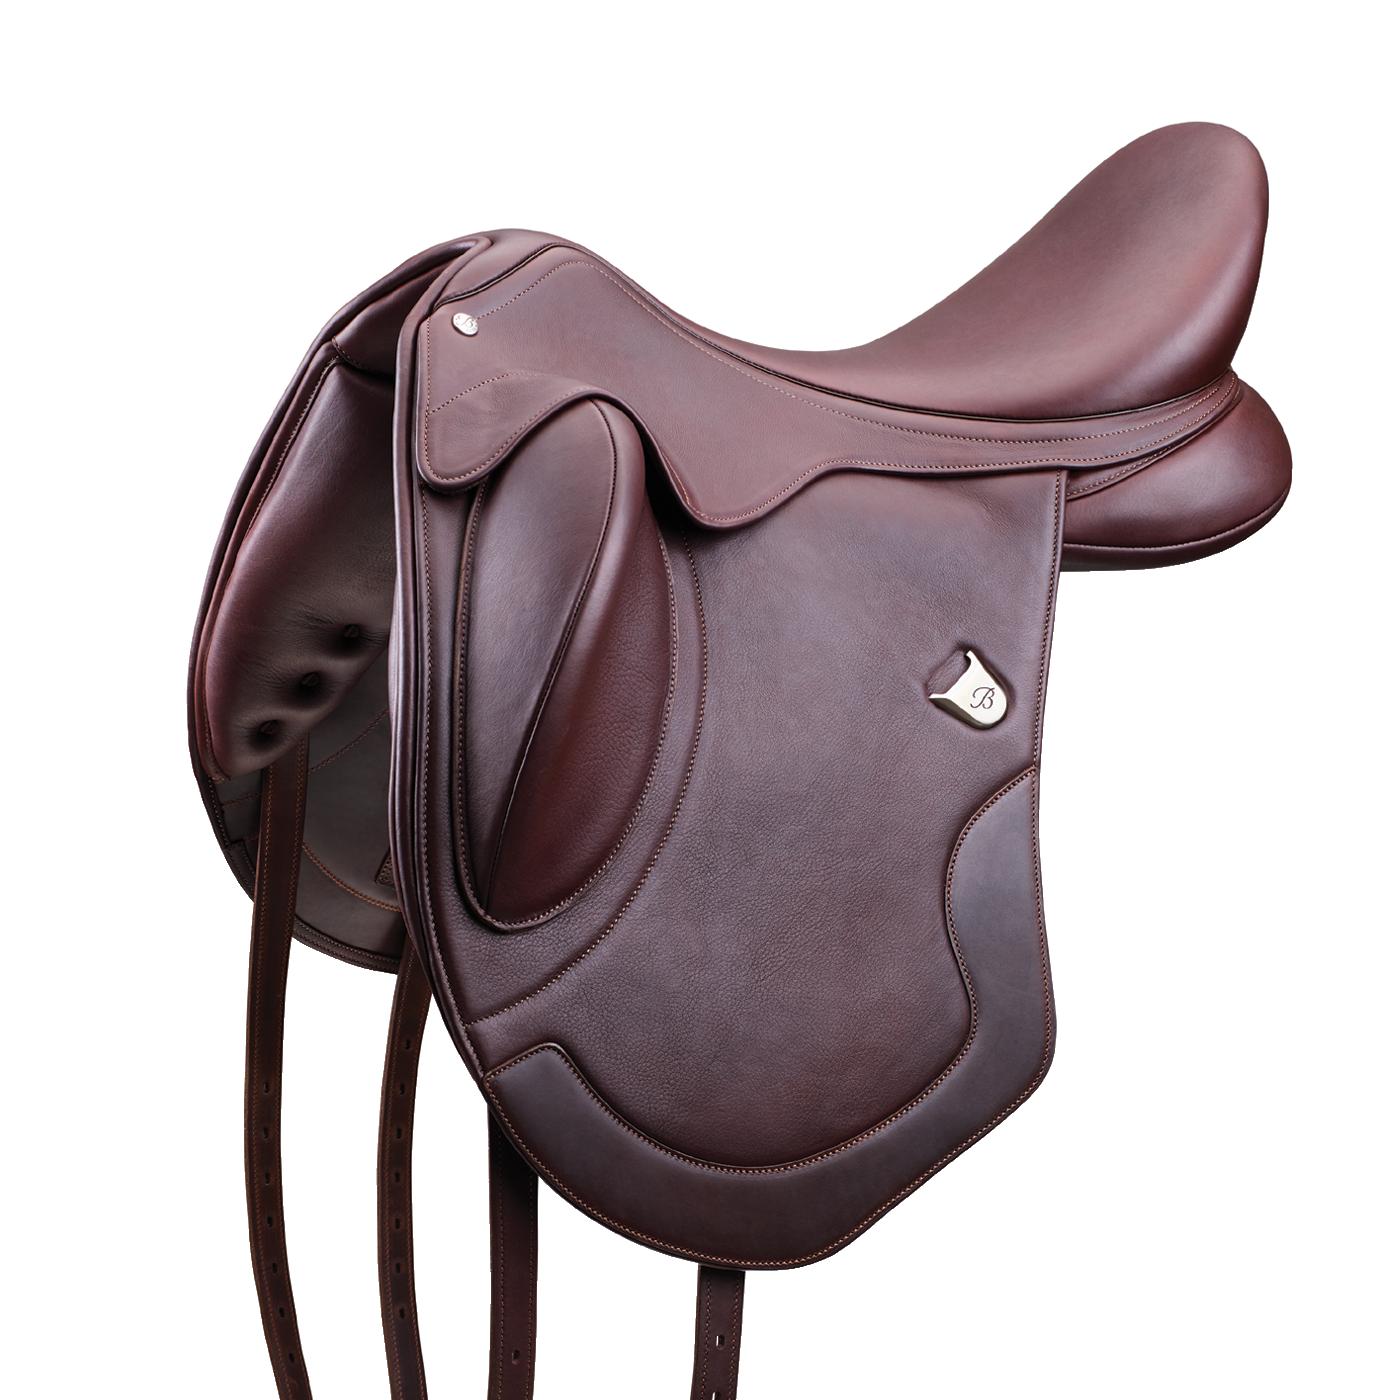 Bates Dressage Saddles